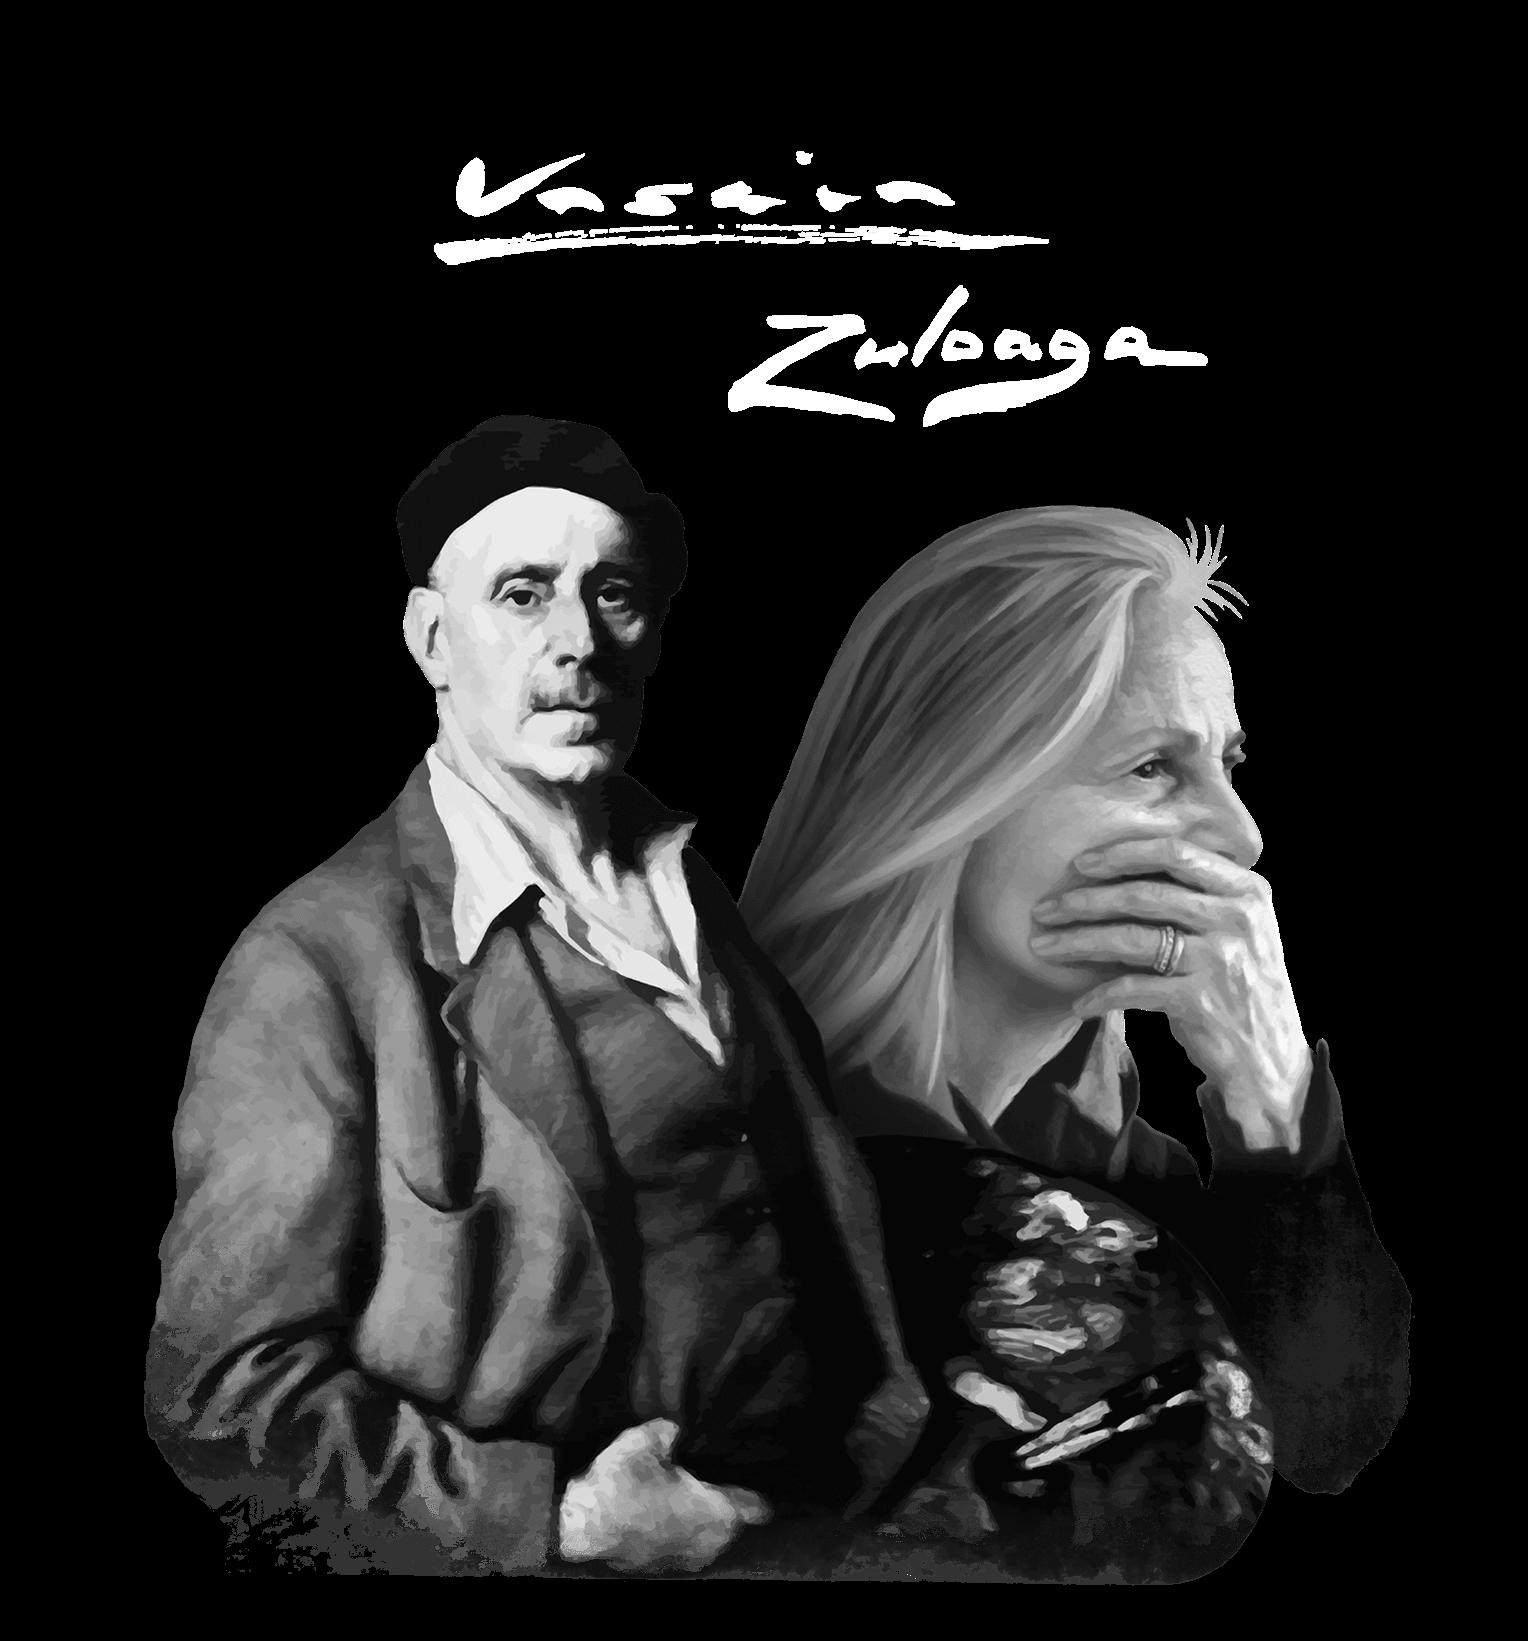 Unsain y Zuloaga